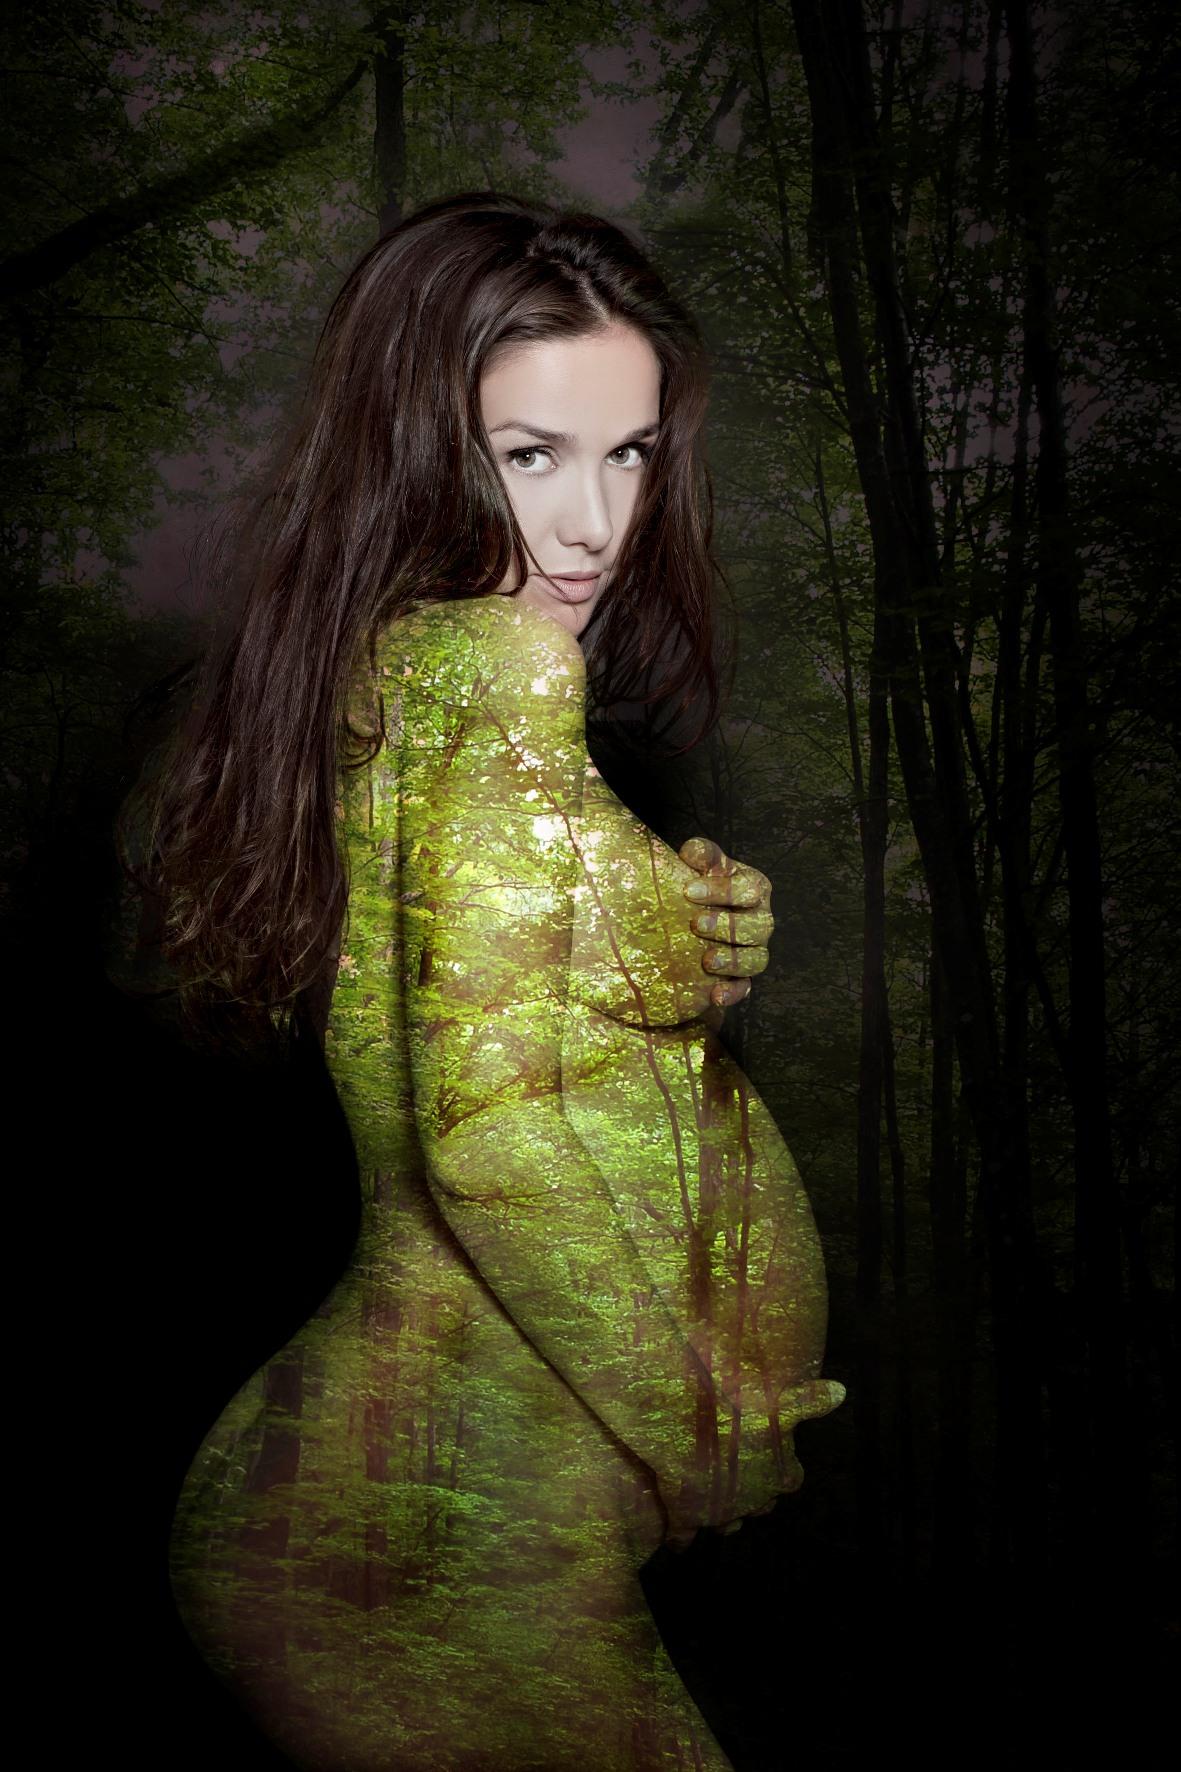 Фото наталья орейро беременная